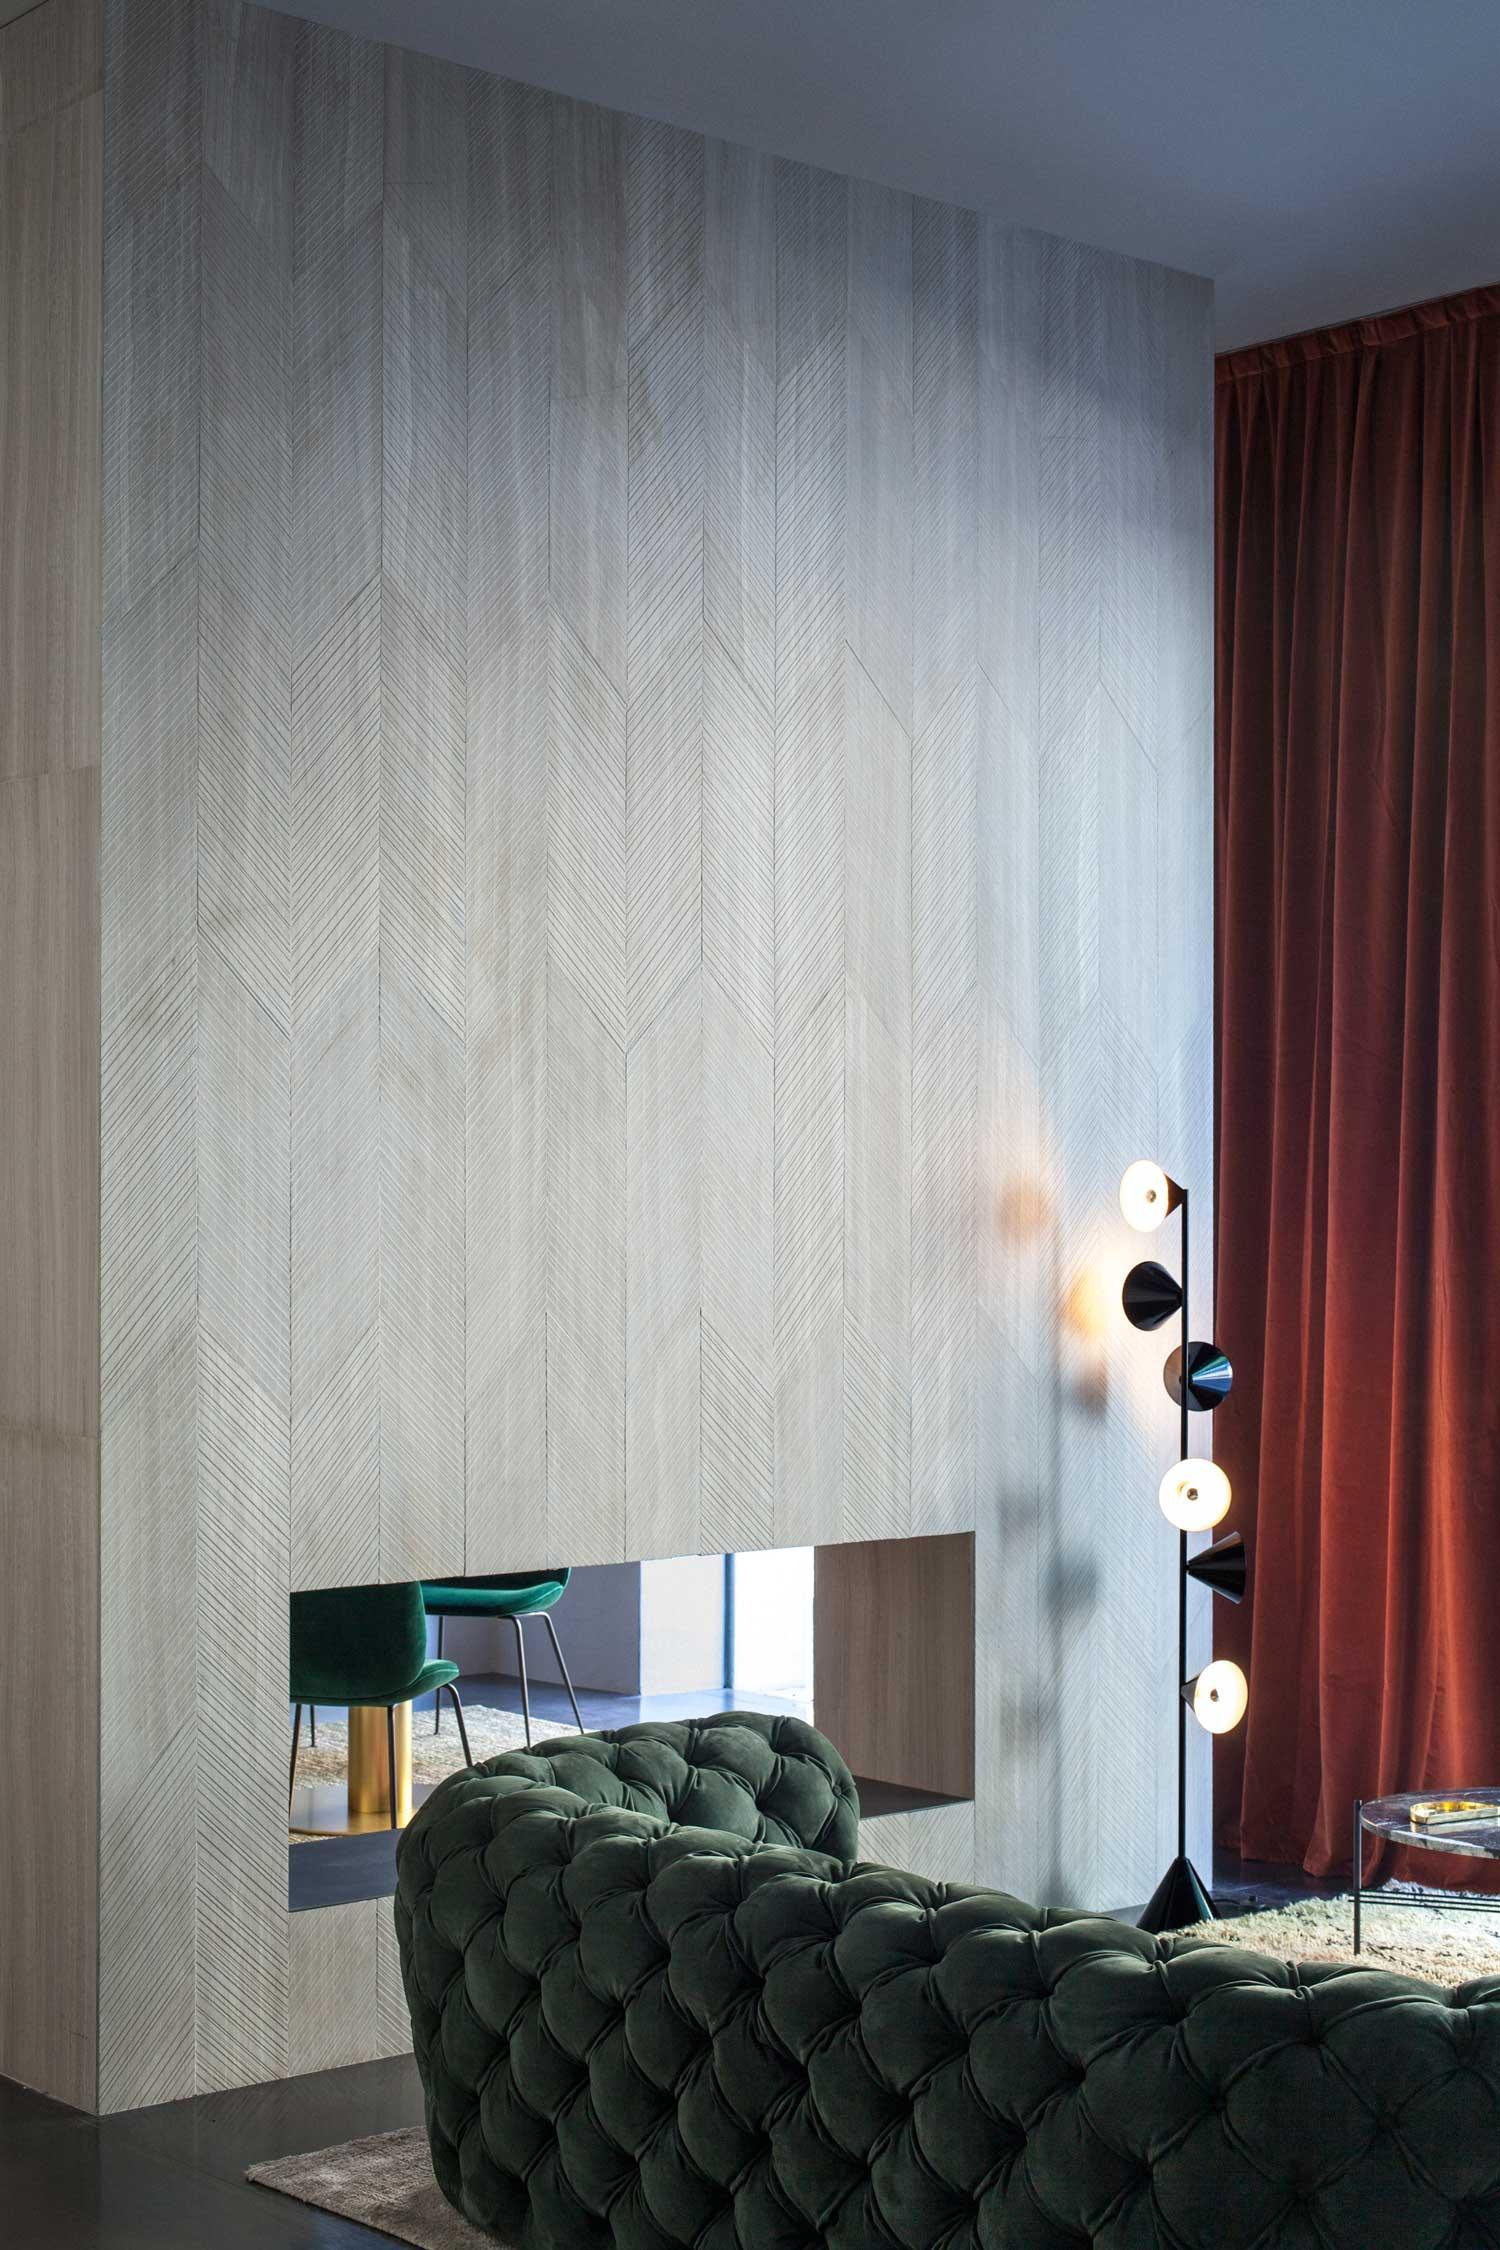 Spotti Milano has revealed their renovated space